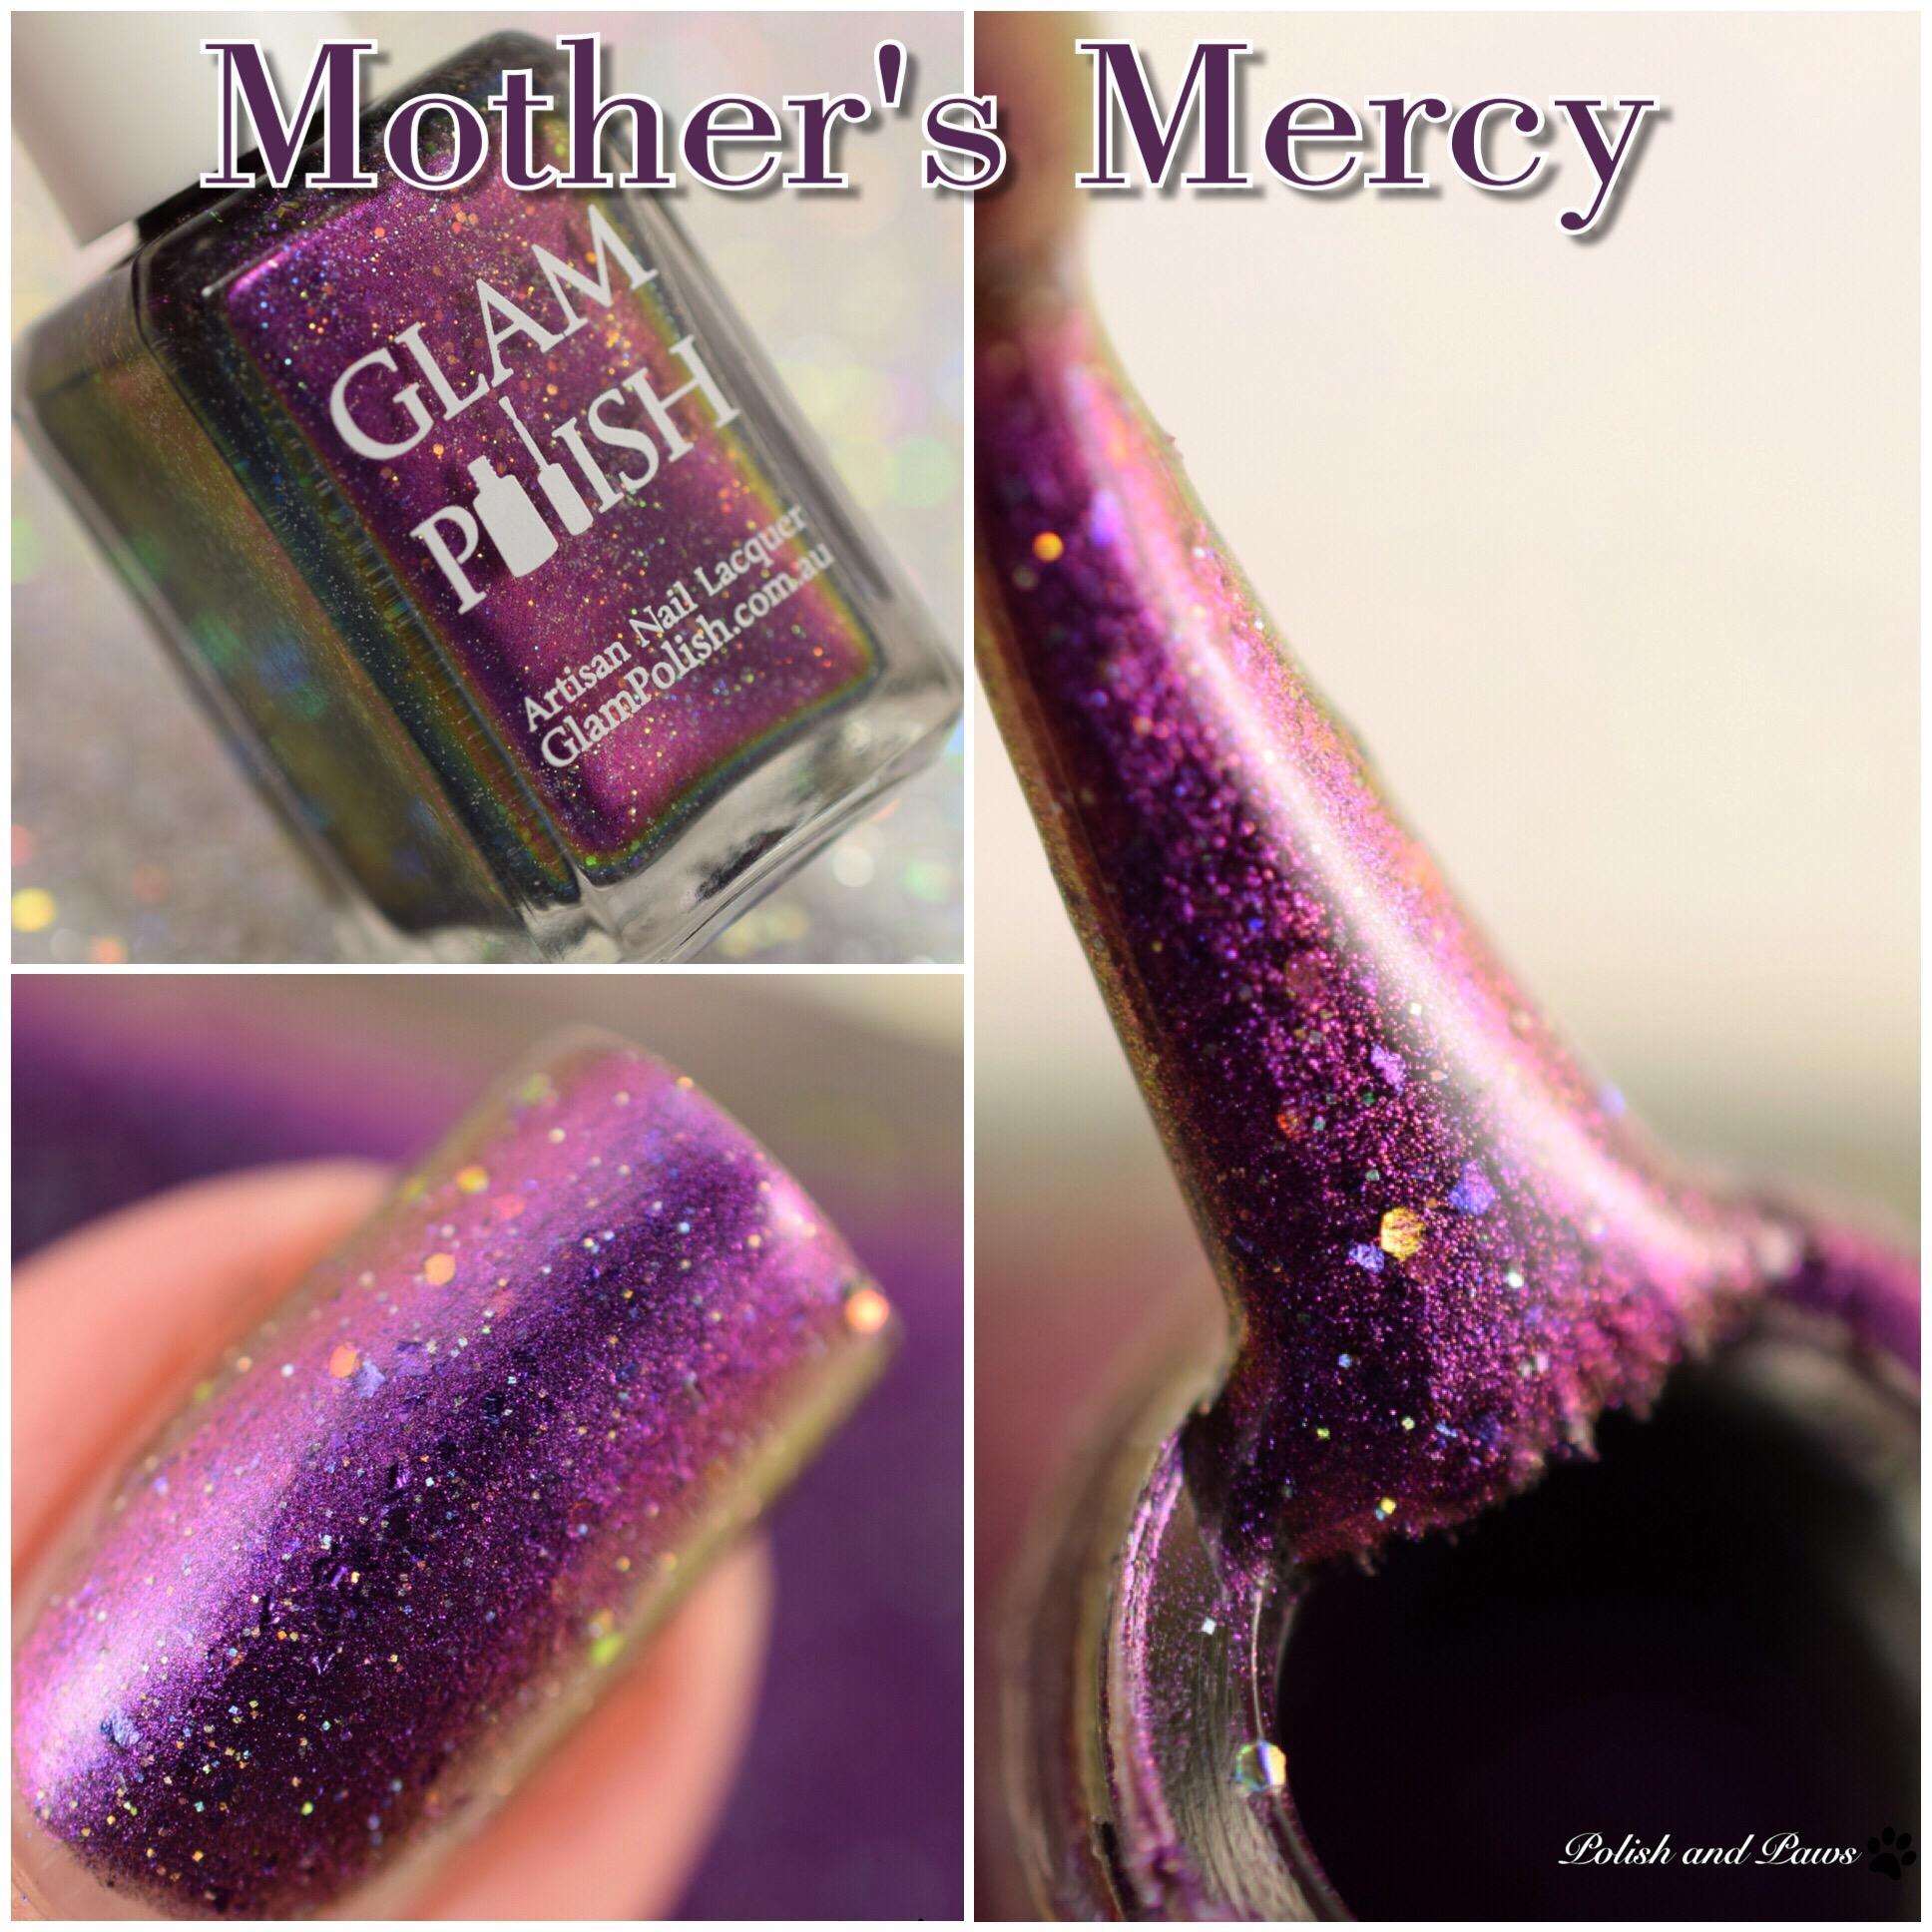 Glam Polish Mothers Mercy